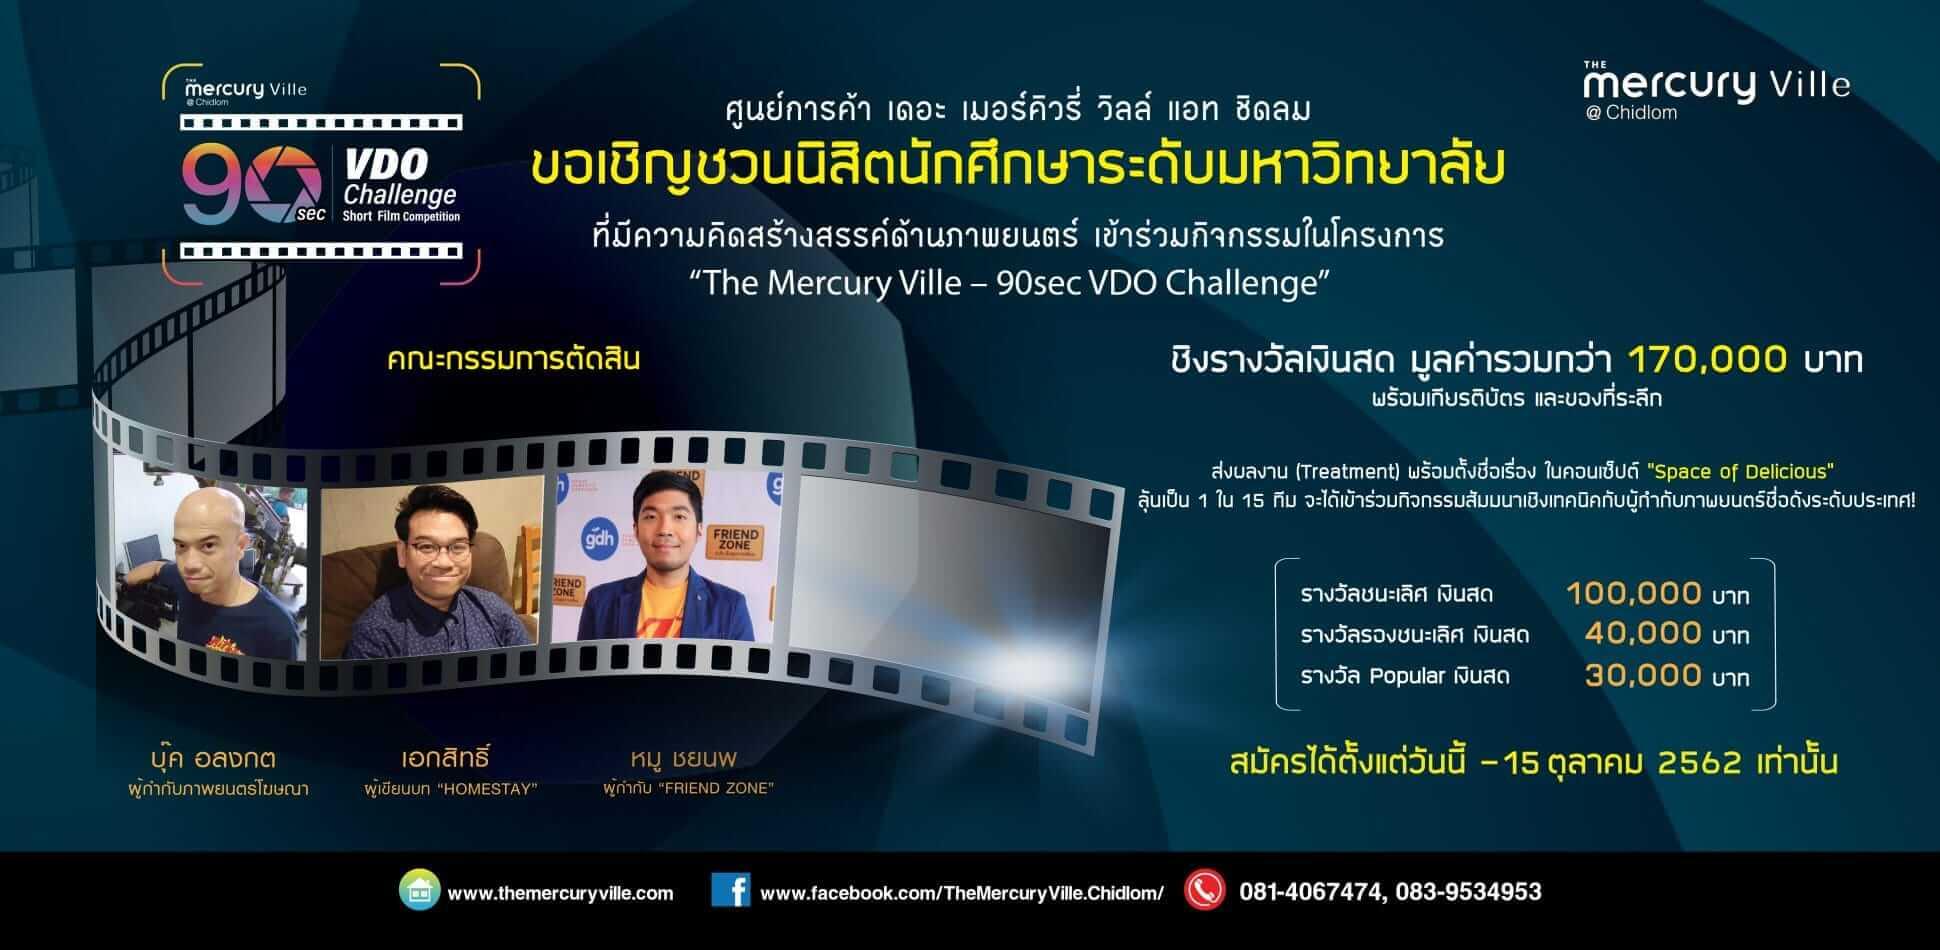 """The Mercury Ville – 90sec VDO Challenge"" สนามประลองไอเดียสำหรับคนรุ่นใหม่! ชิงรางวัลเงินสด สูงสุด 100,000 บาท!!"